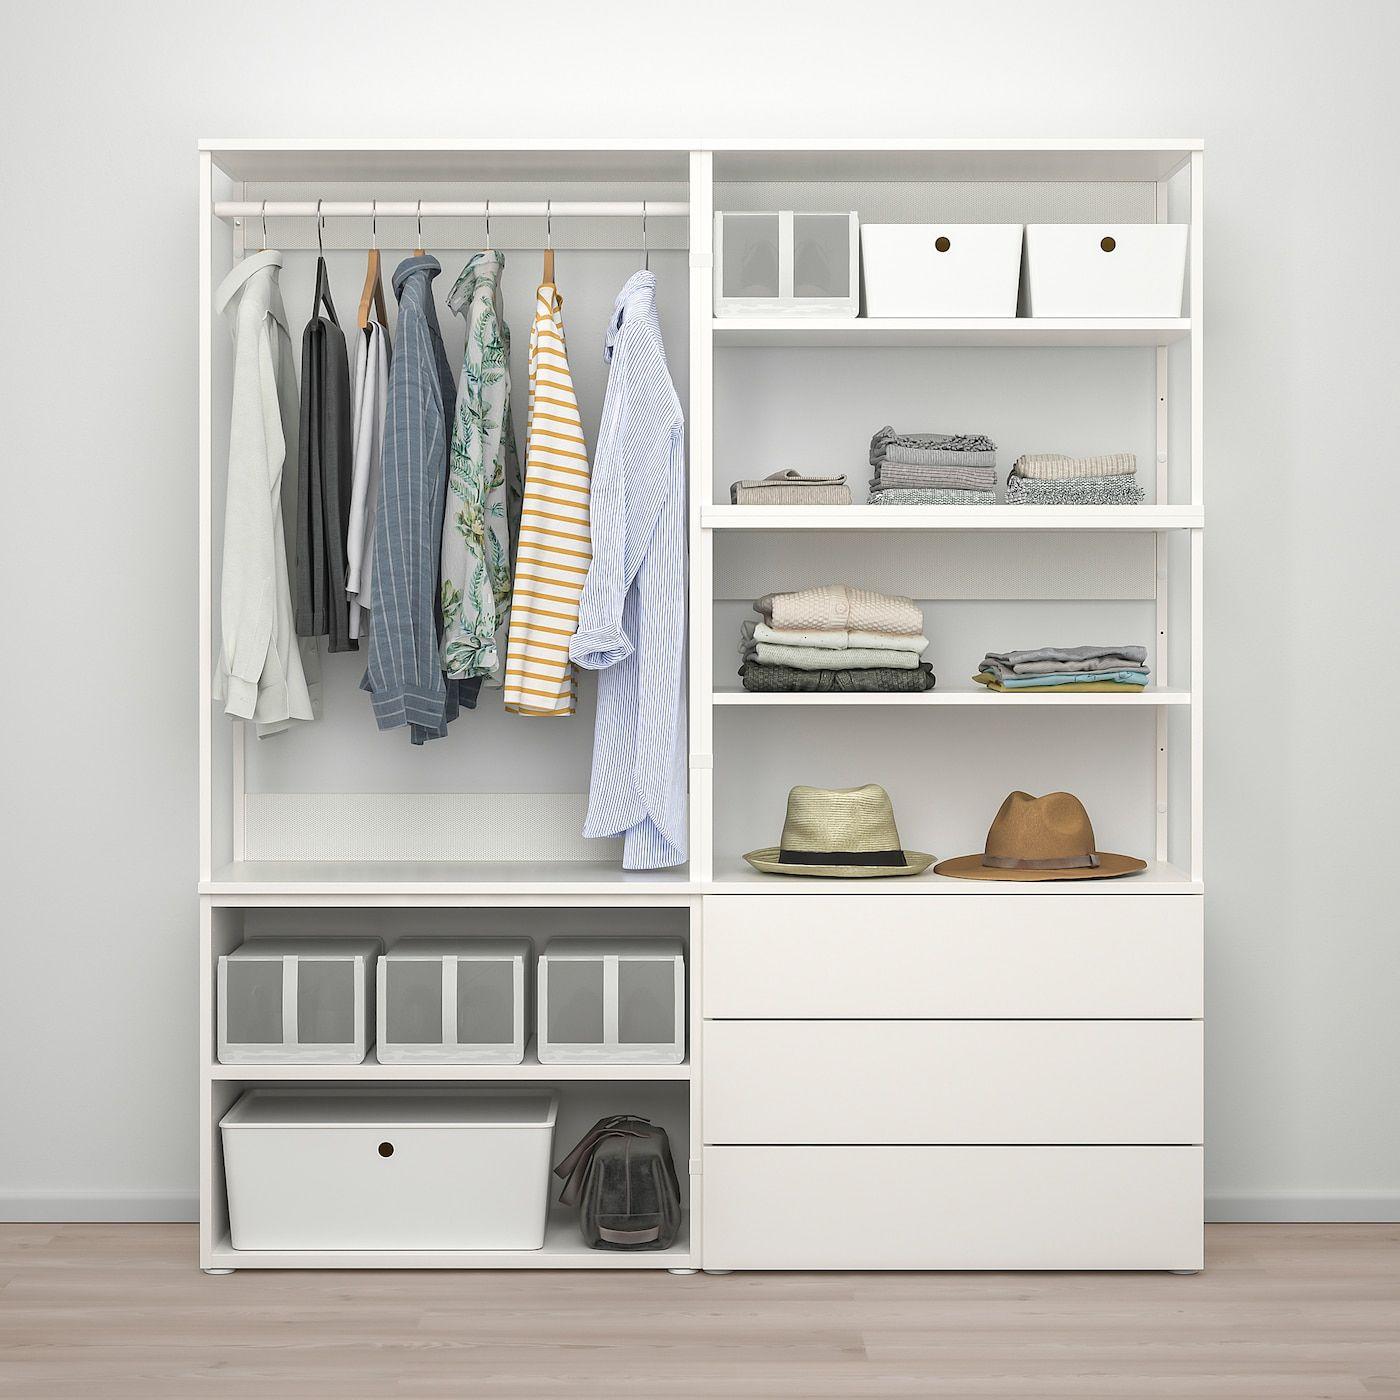 Ikea Schrank Weiß Drei Türen